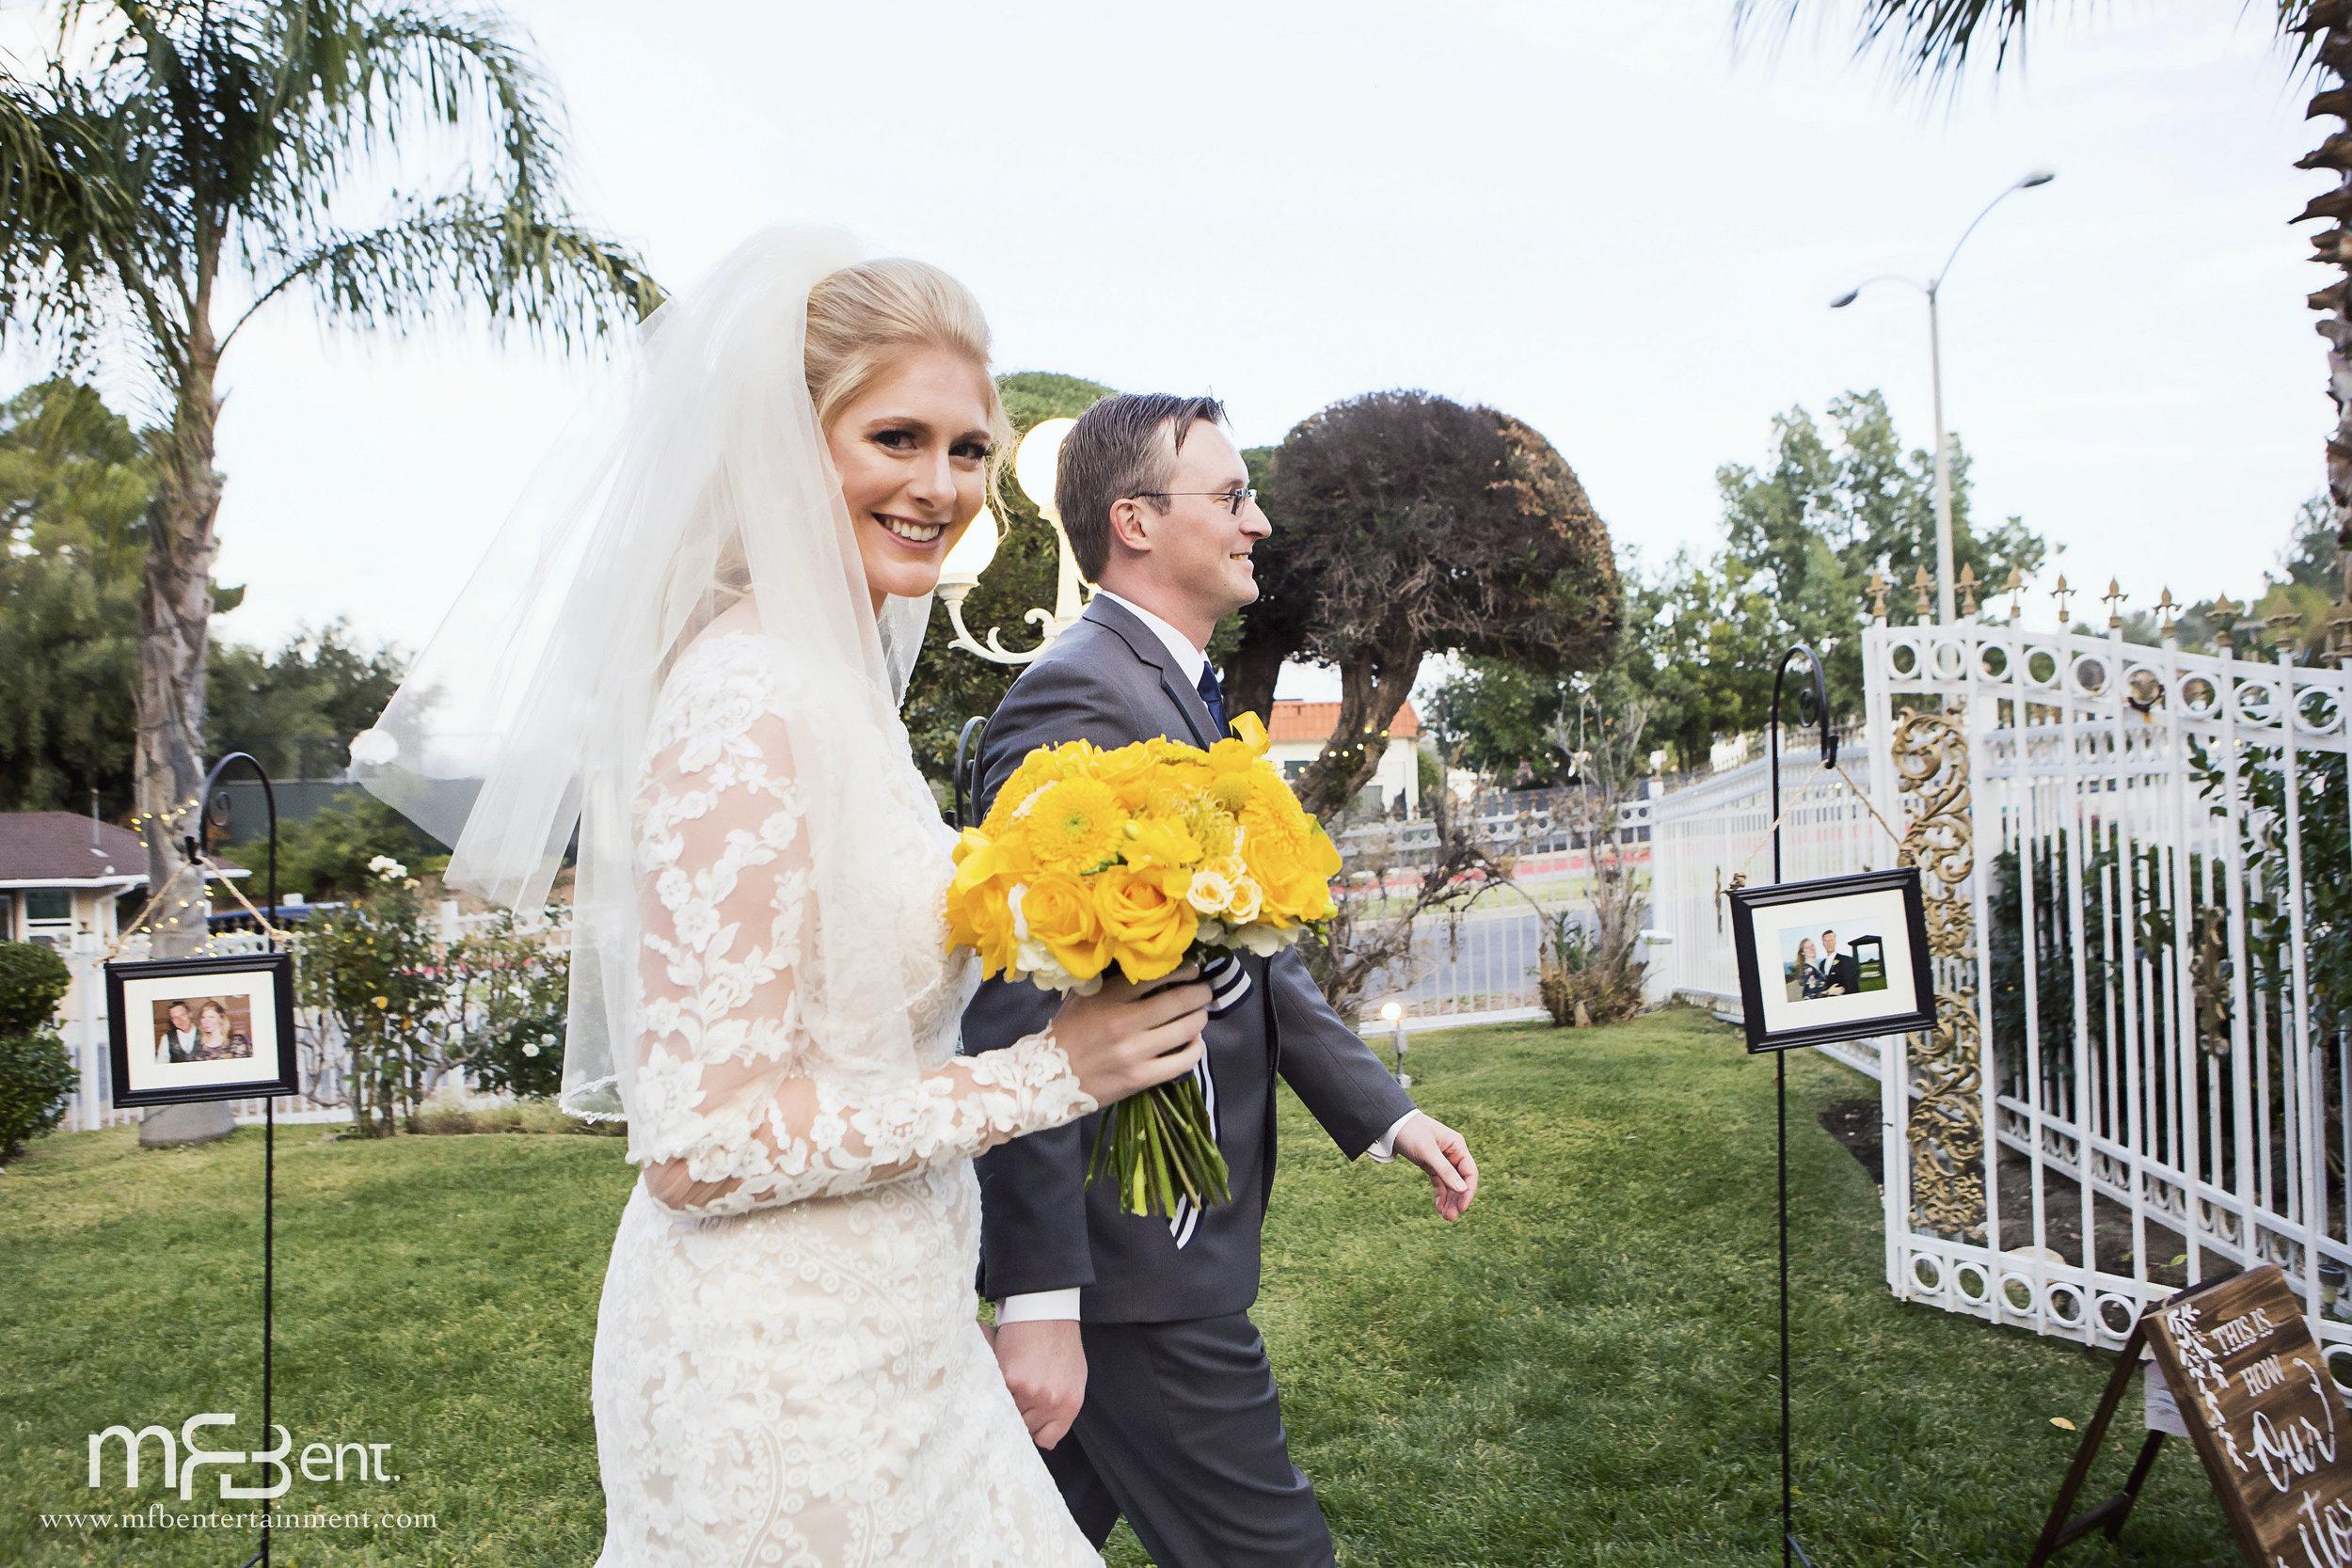 PIOTR CHELSEA WEDDING-CEREMONY-0147 L.jpg